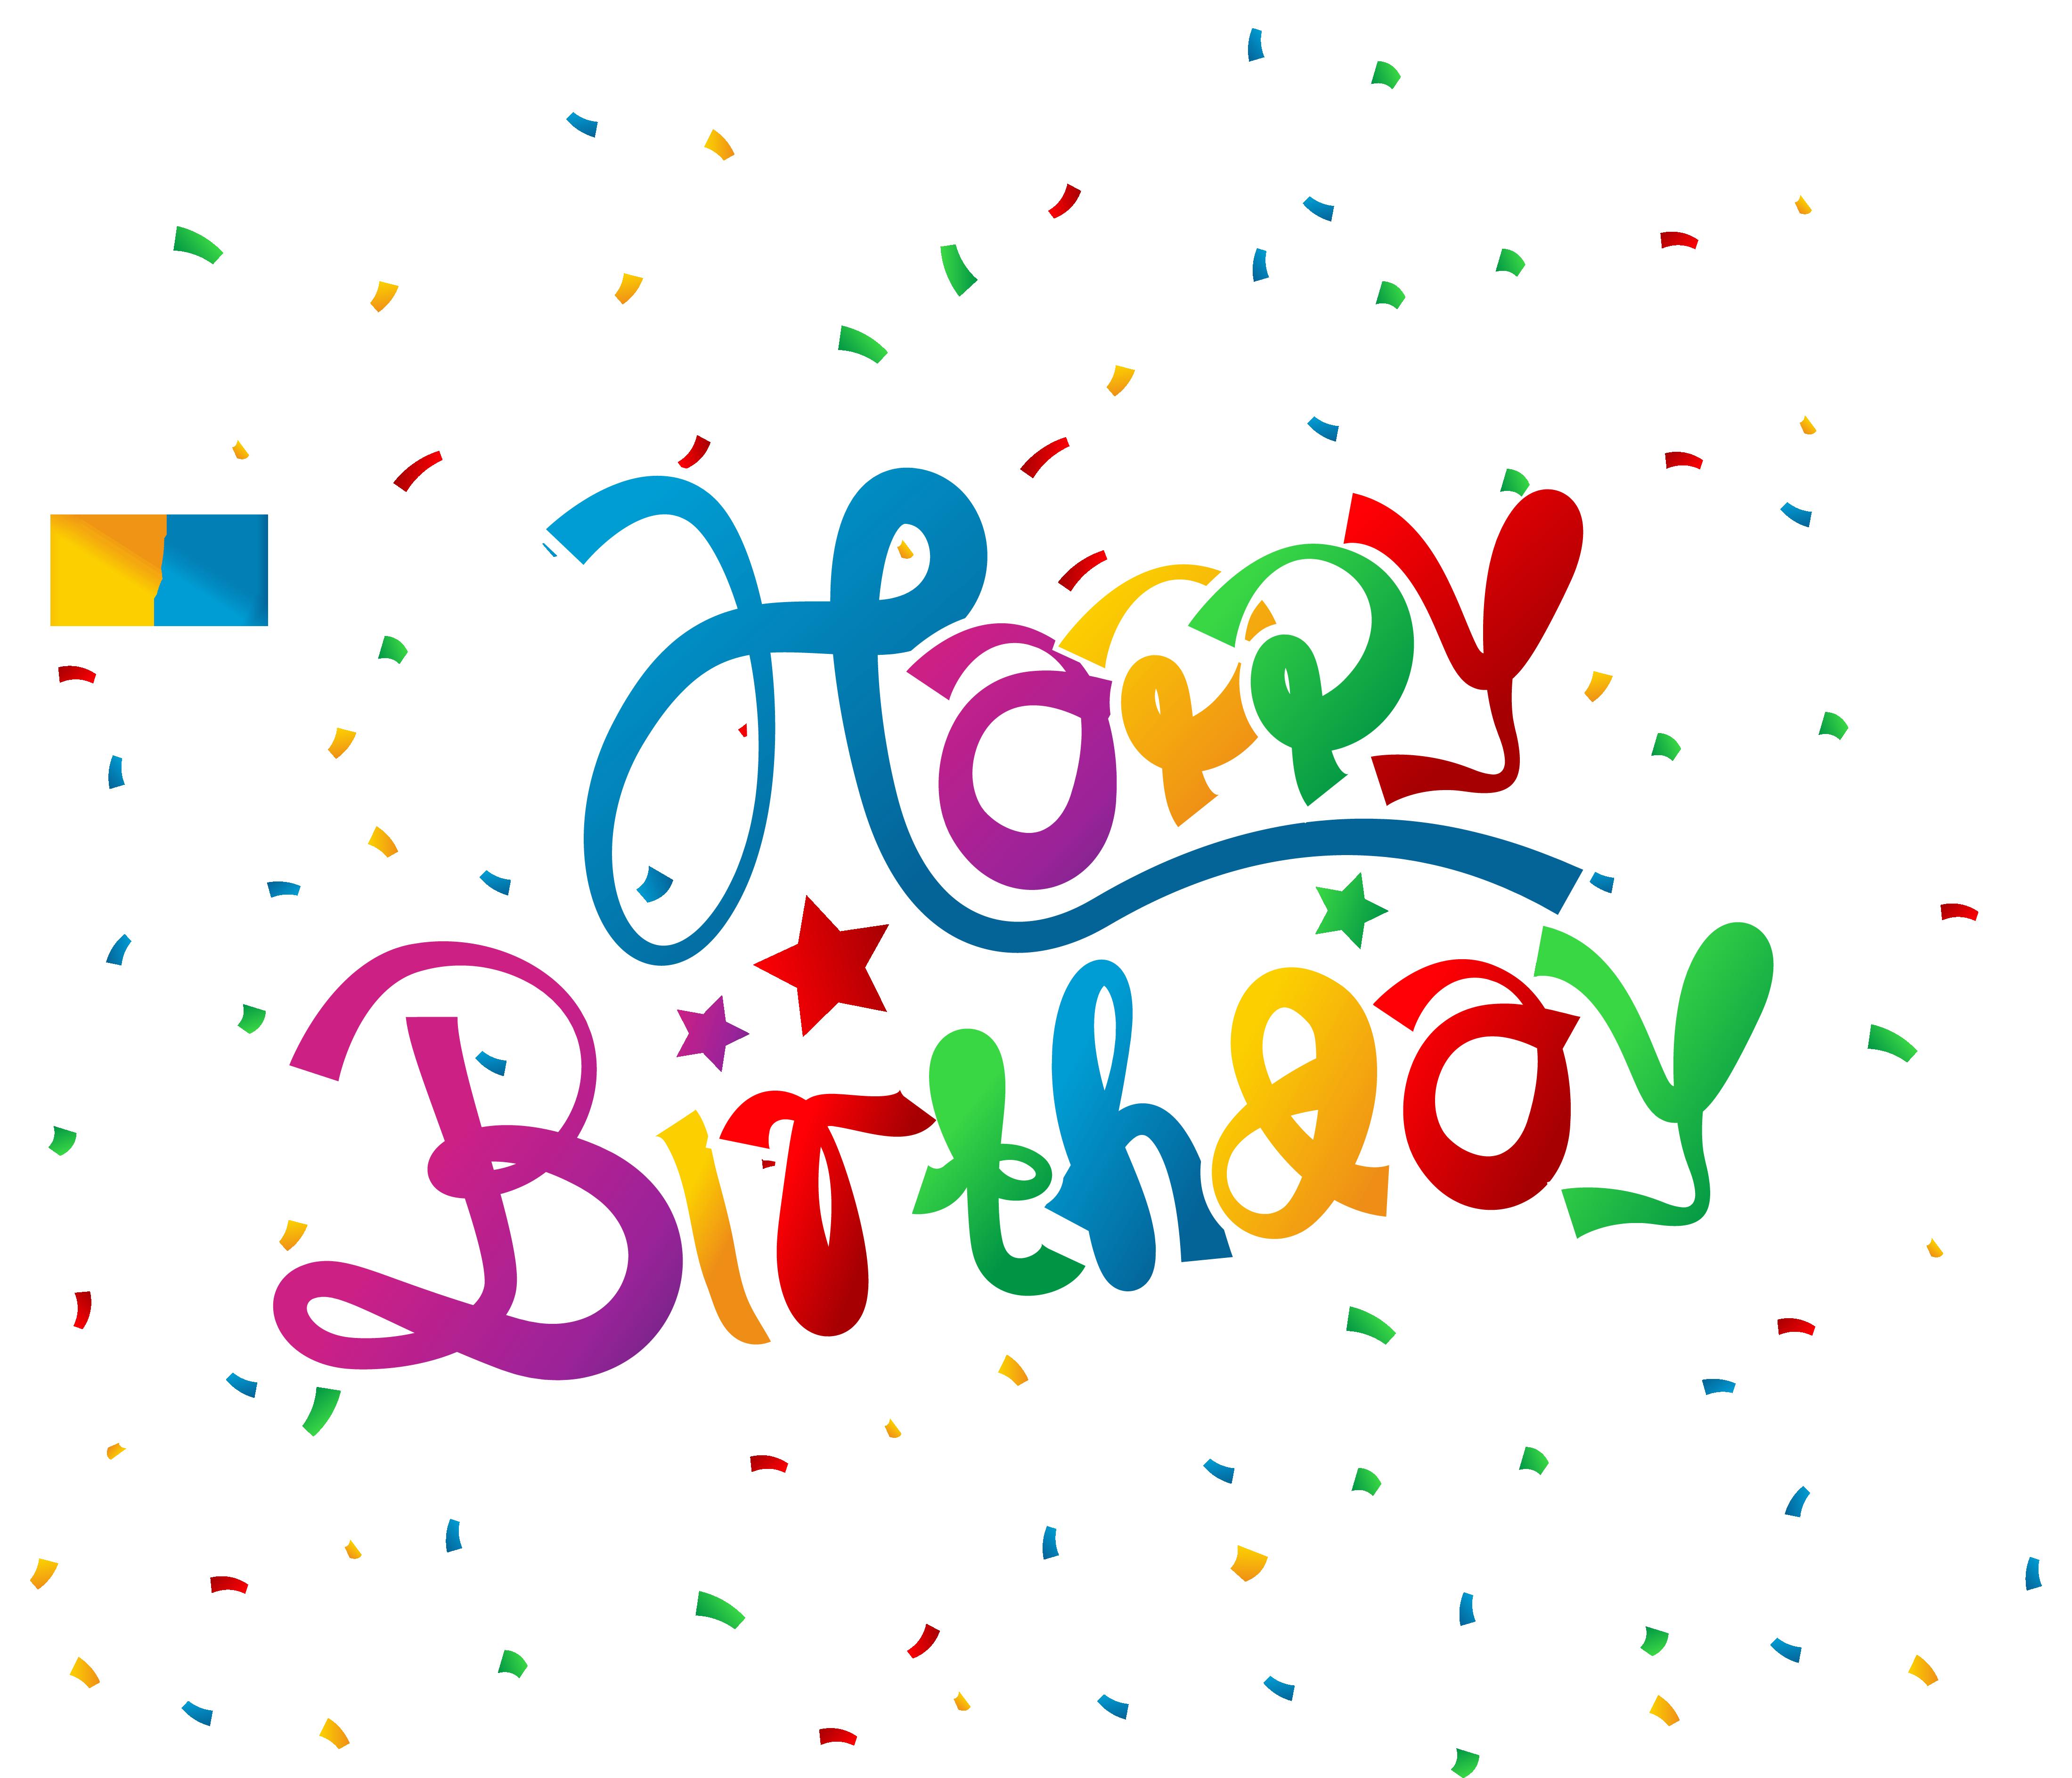 Cone clipart happy birthday. With confetti picture gallery